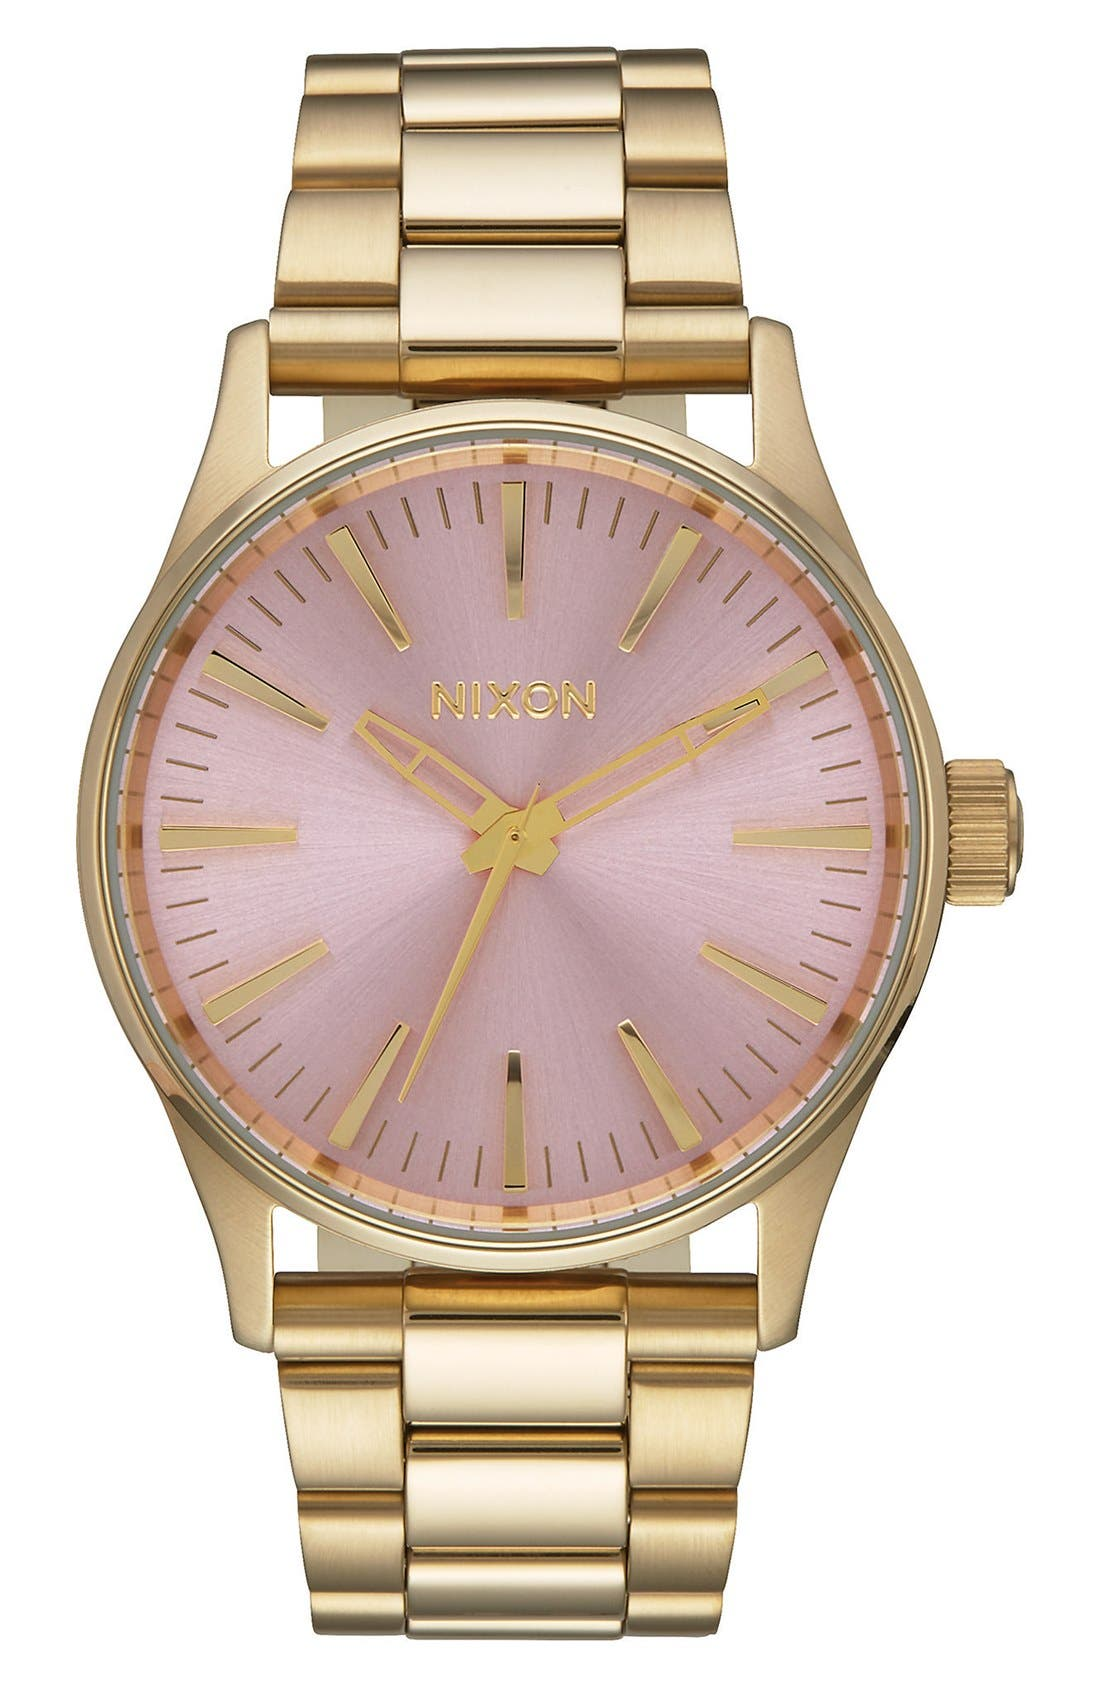 Main Image - Nixon 'Sentry' Bracelet Watch, 38mm